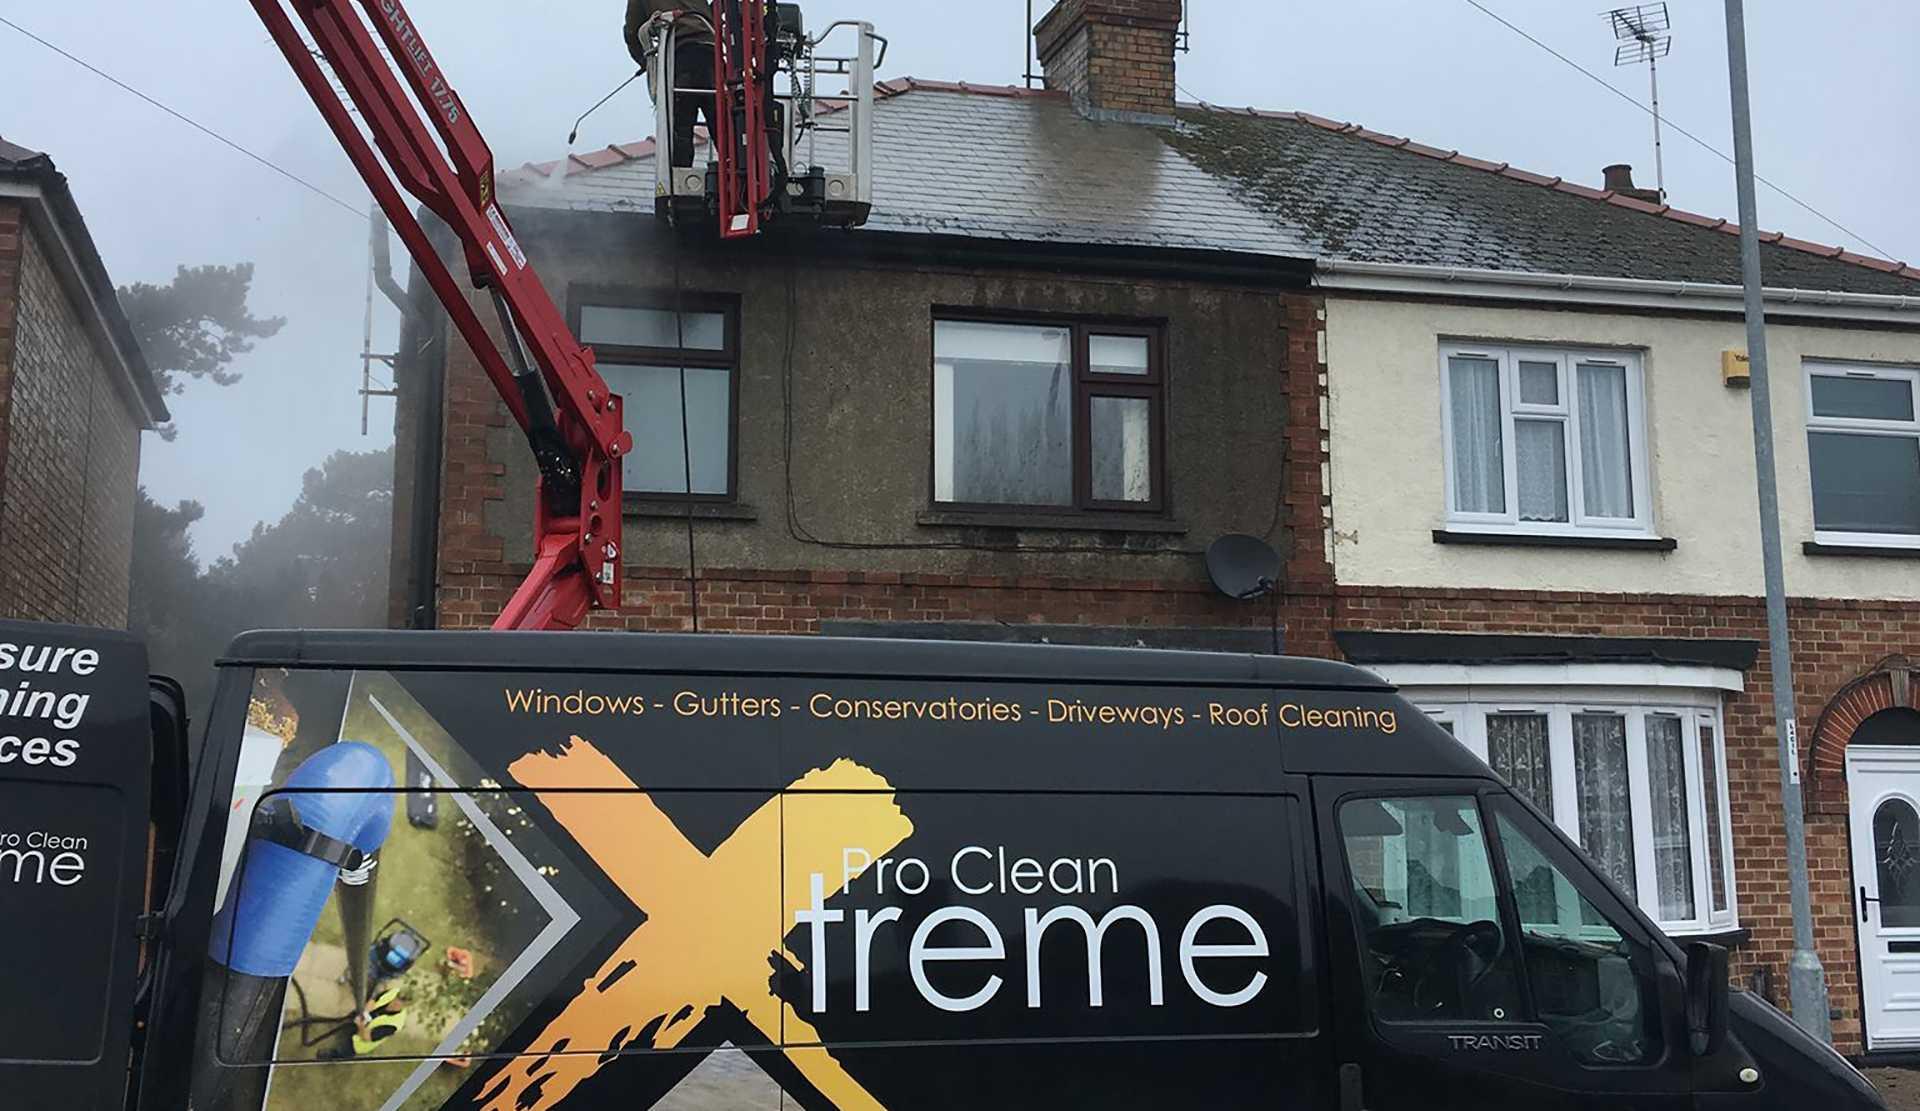 Pro Clean Xtreme Cambridgeshire